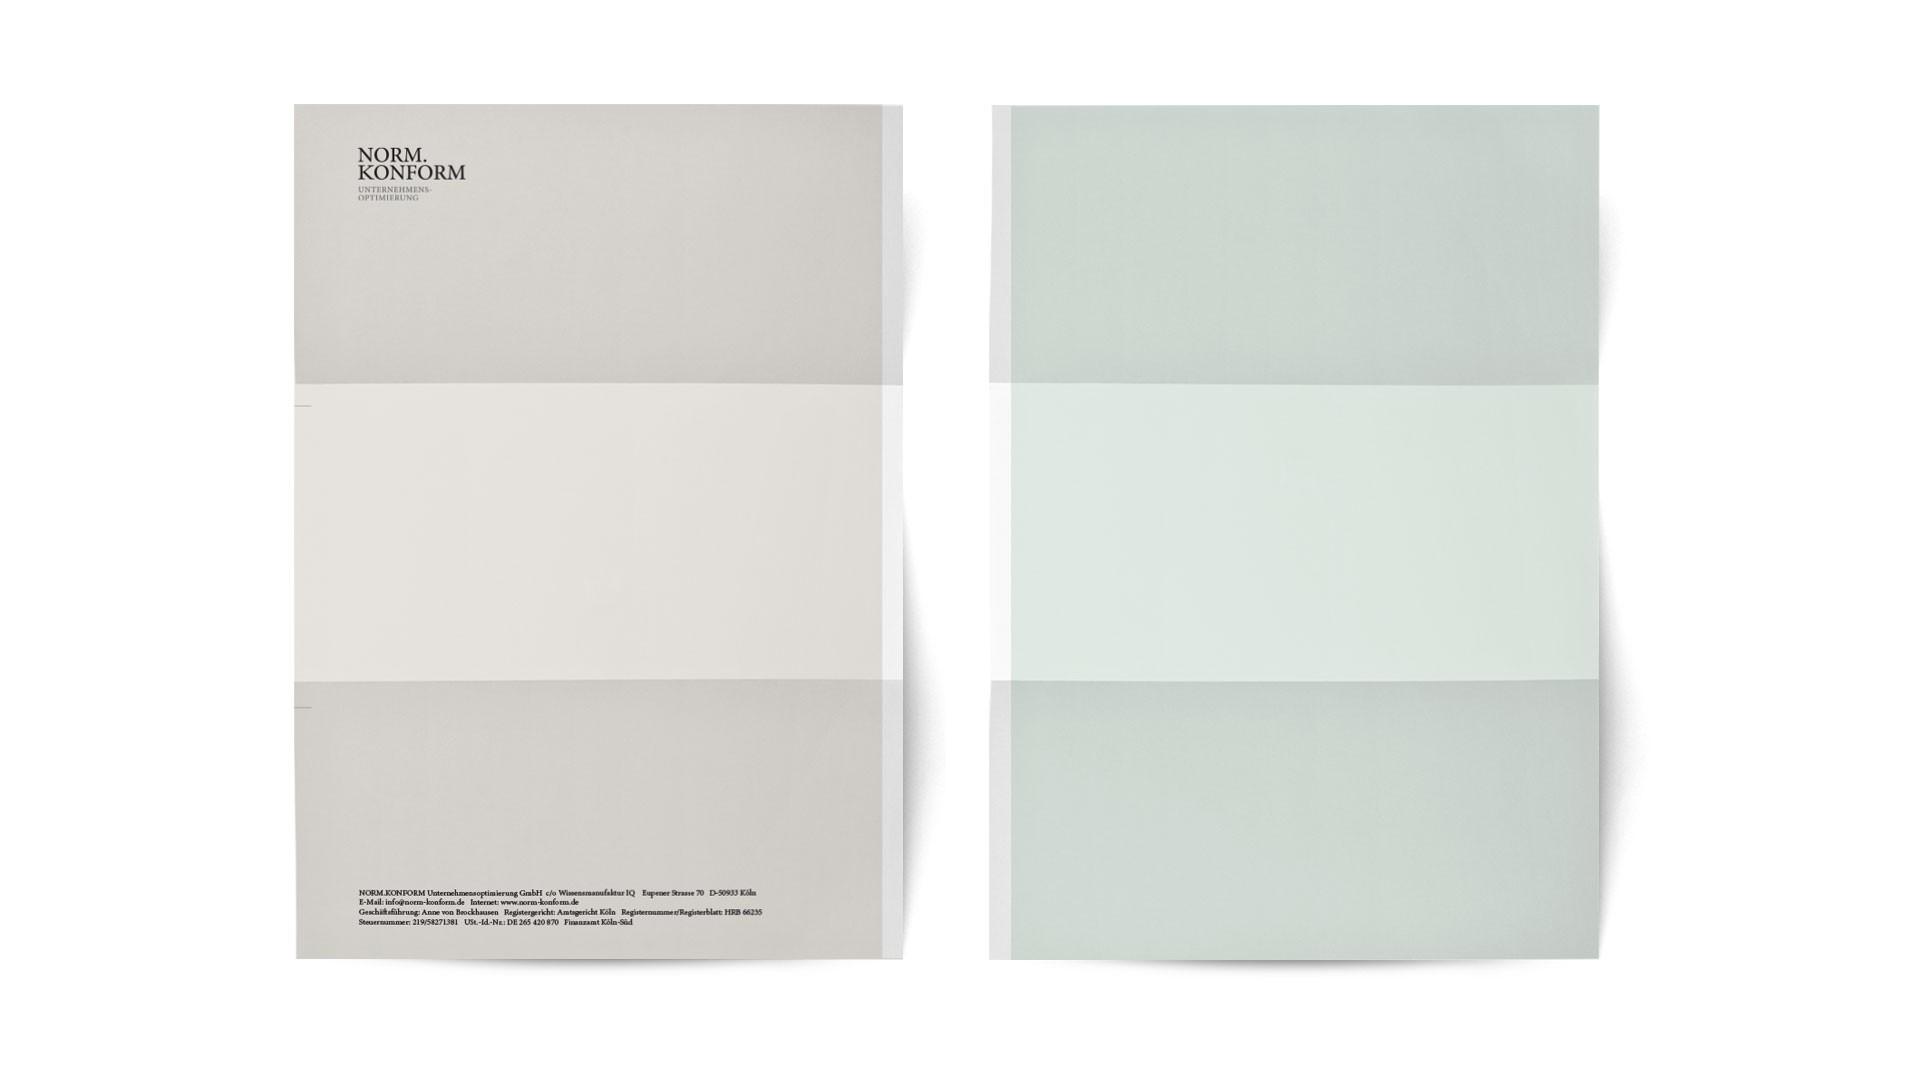 BUREAU KUEPPERS Corporate Design für Norm.Konform GmbH